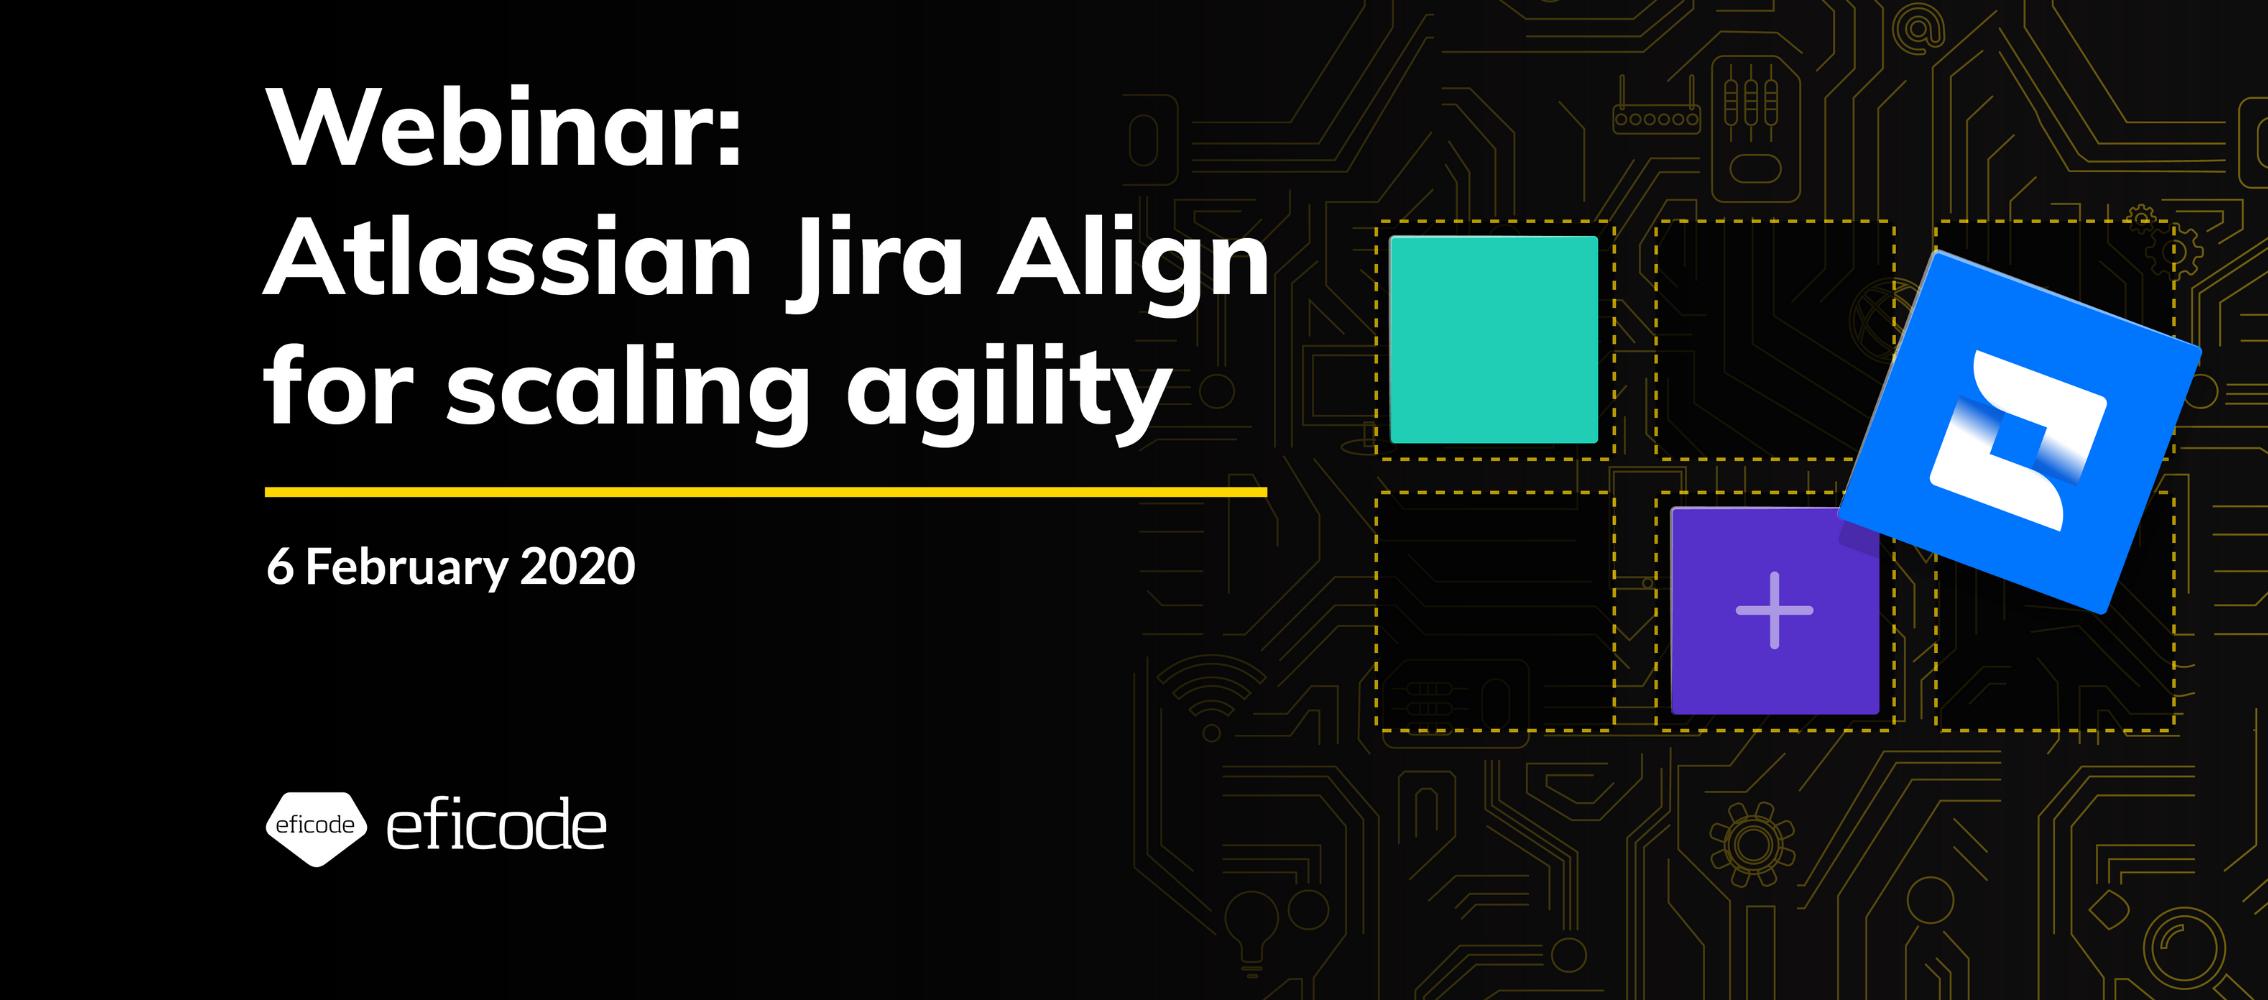 Webinar: Atlassian Jira Align for scaling agility